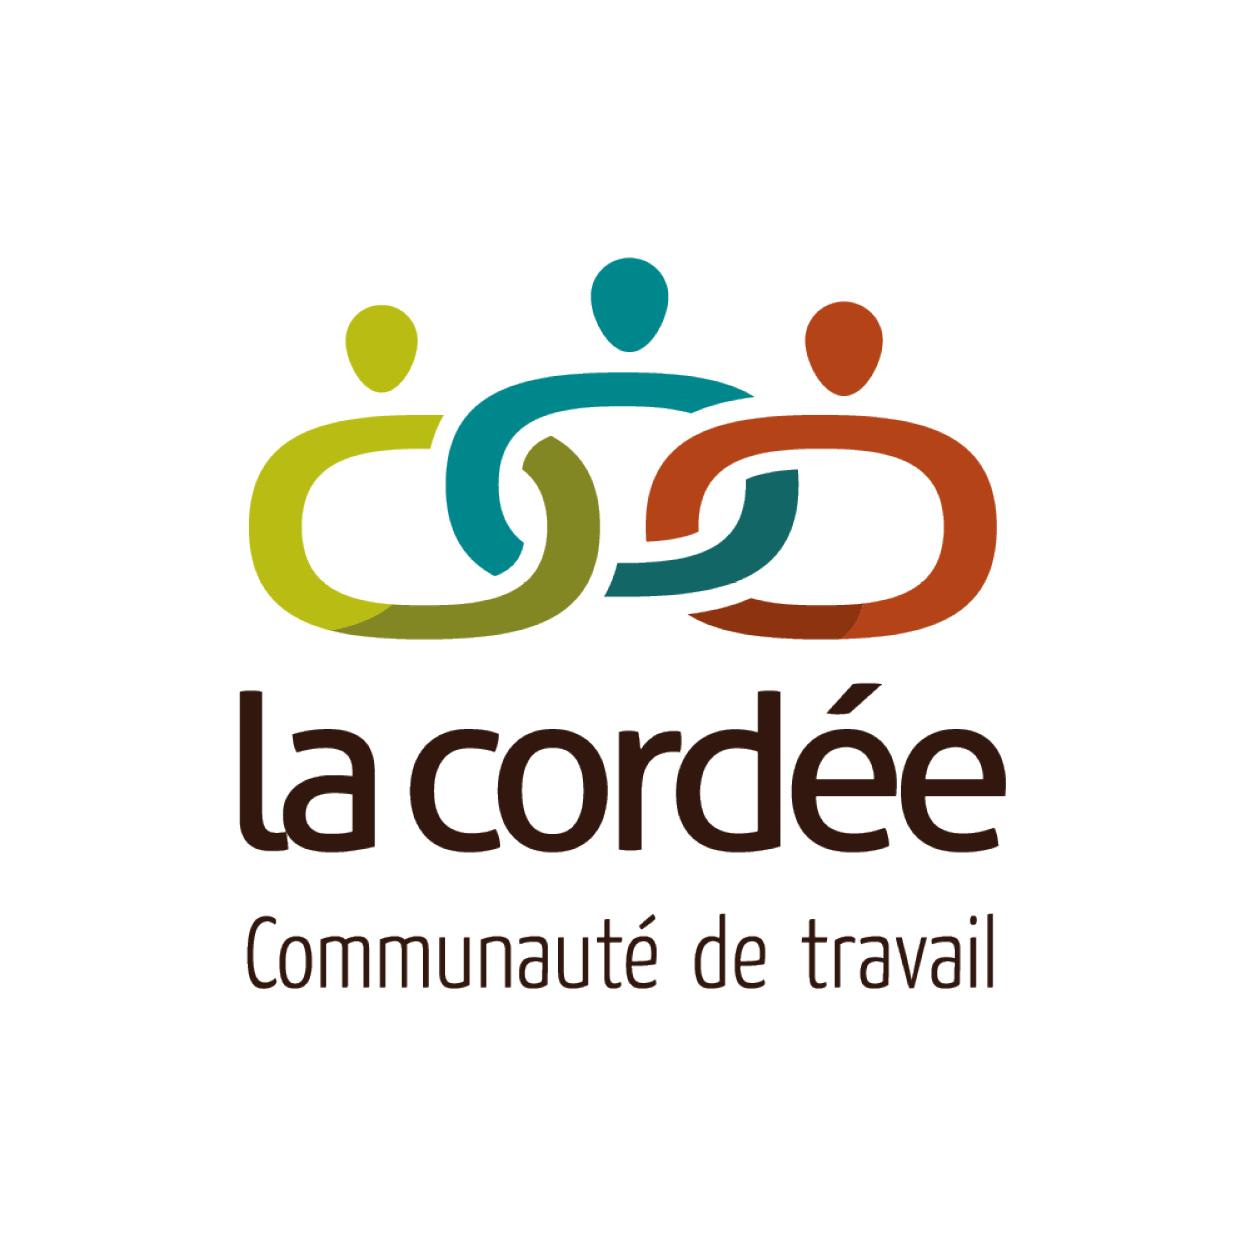 Cordee_logo